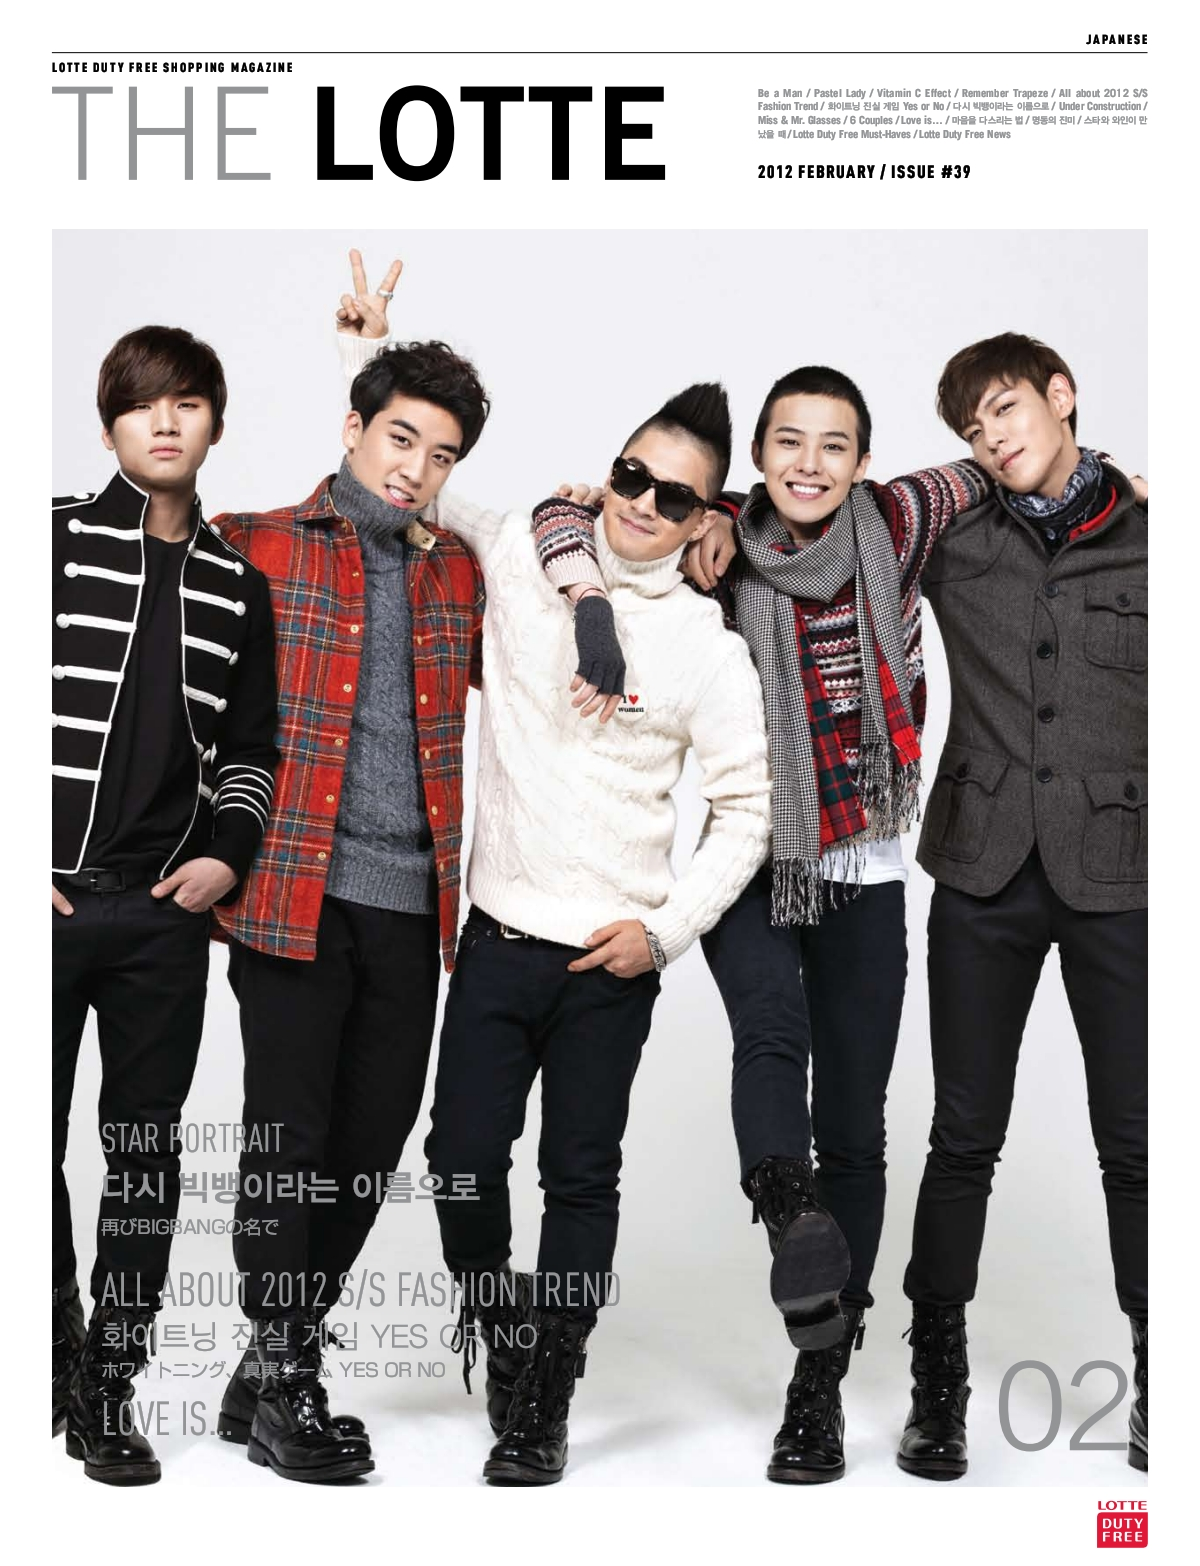 http://2.bp.blogspot.com/-cn1_MCXhxbE/TypW1AEWkdI/AAAAAAAAQcQ/gdtKHtMN6_s/s1600/BIGBANG+Lotte+Magazine_002.jpg